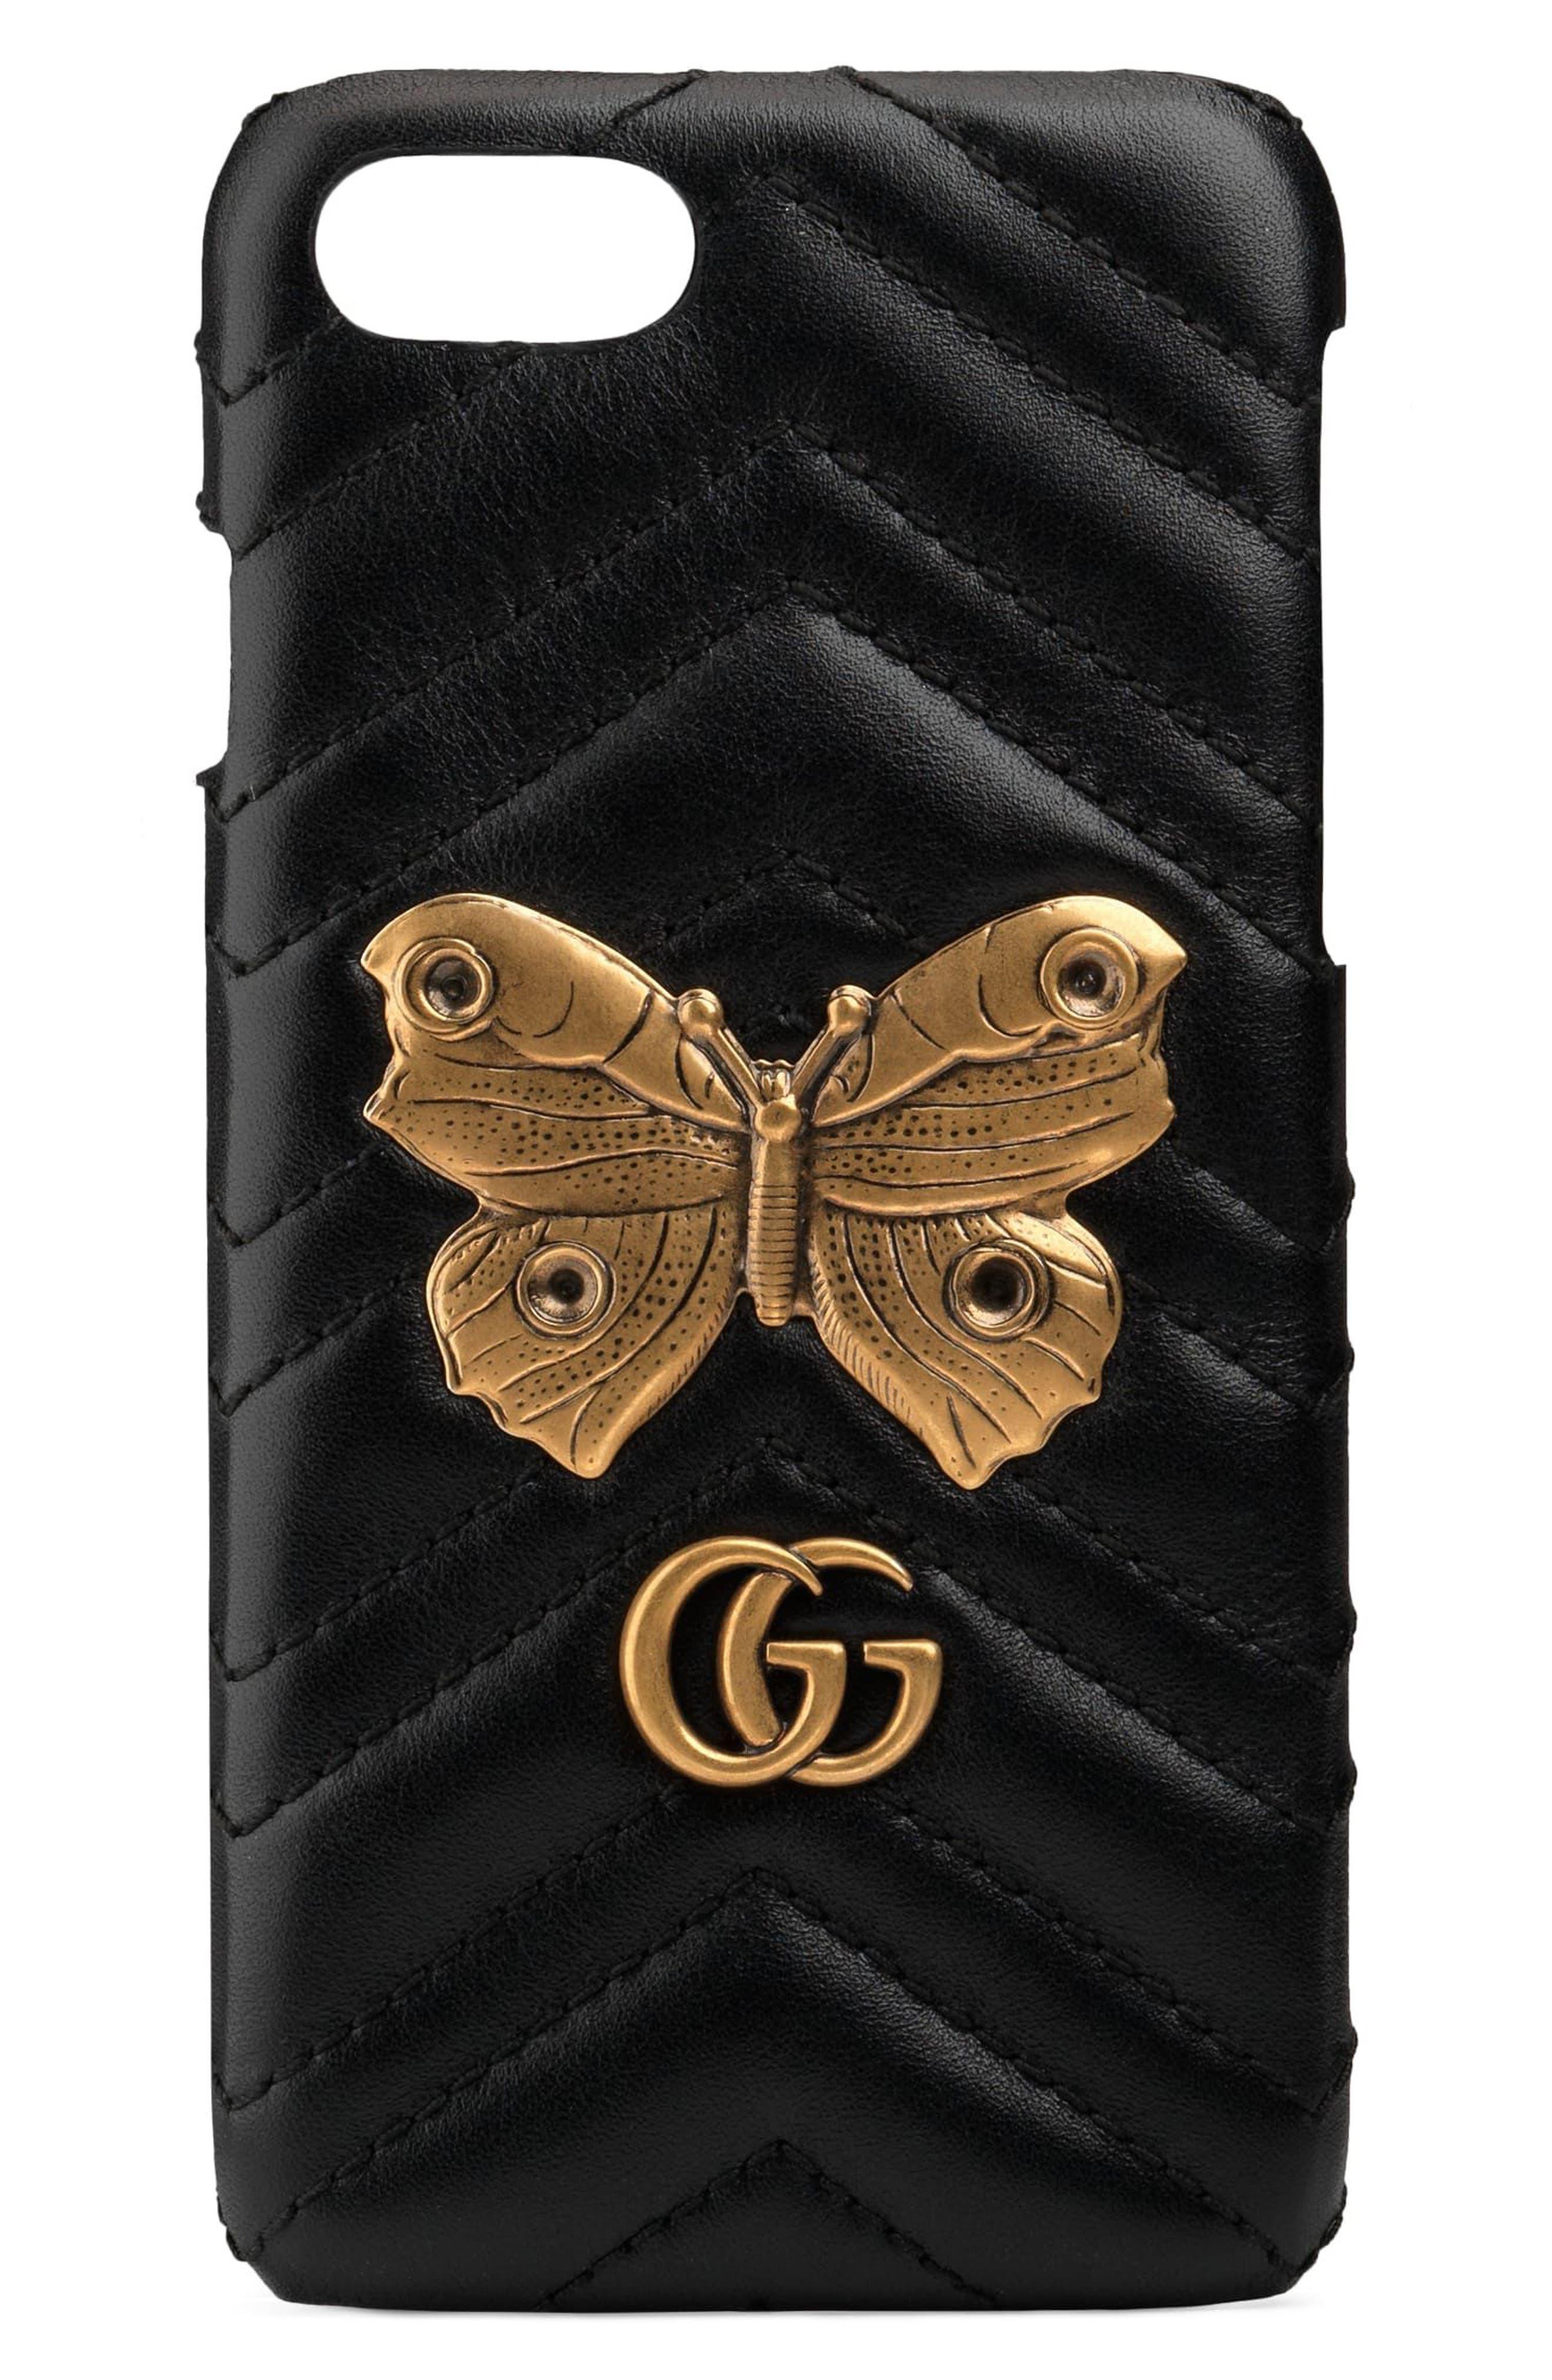 gucci iphone 7 case. gucci gg marmont 2.0 matelassé leather iphone 7 case iphone